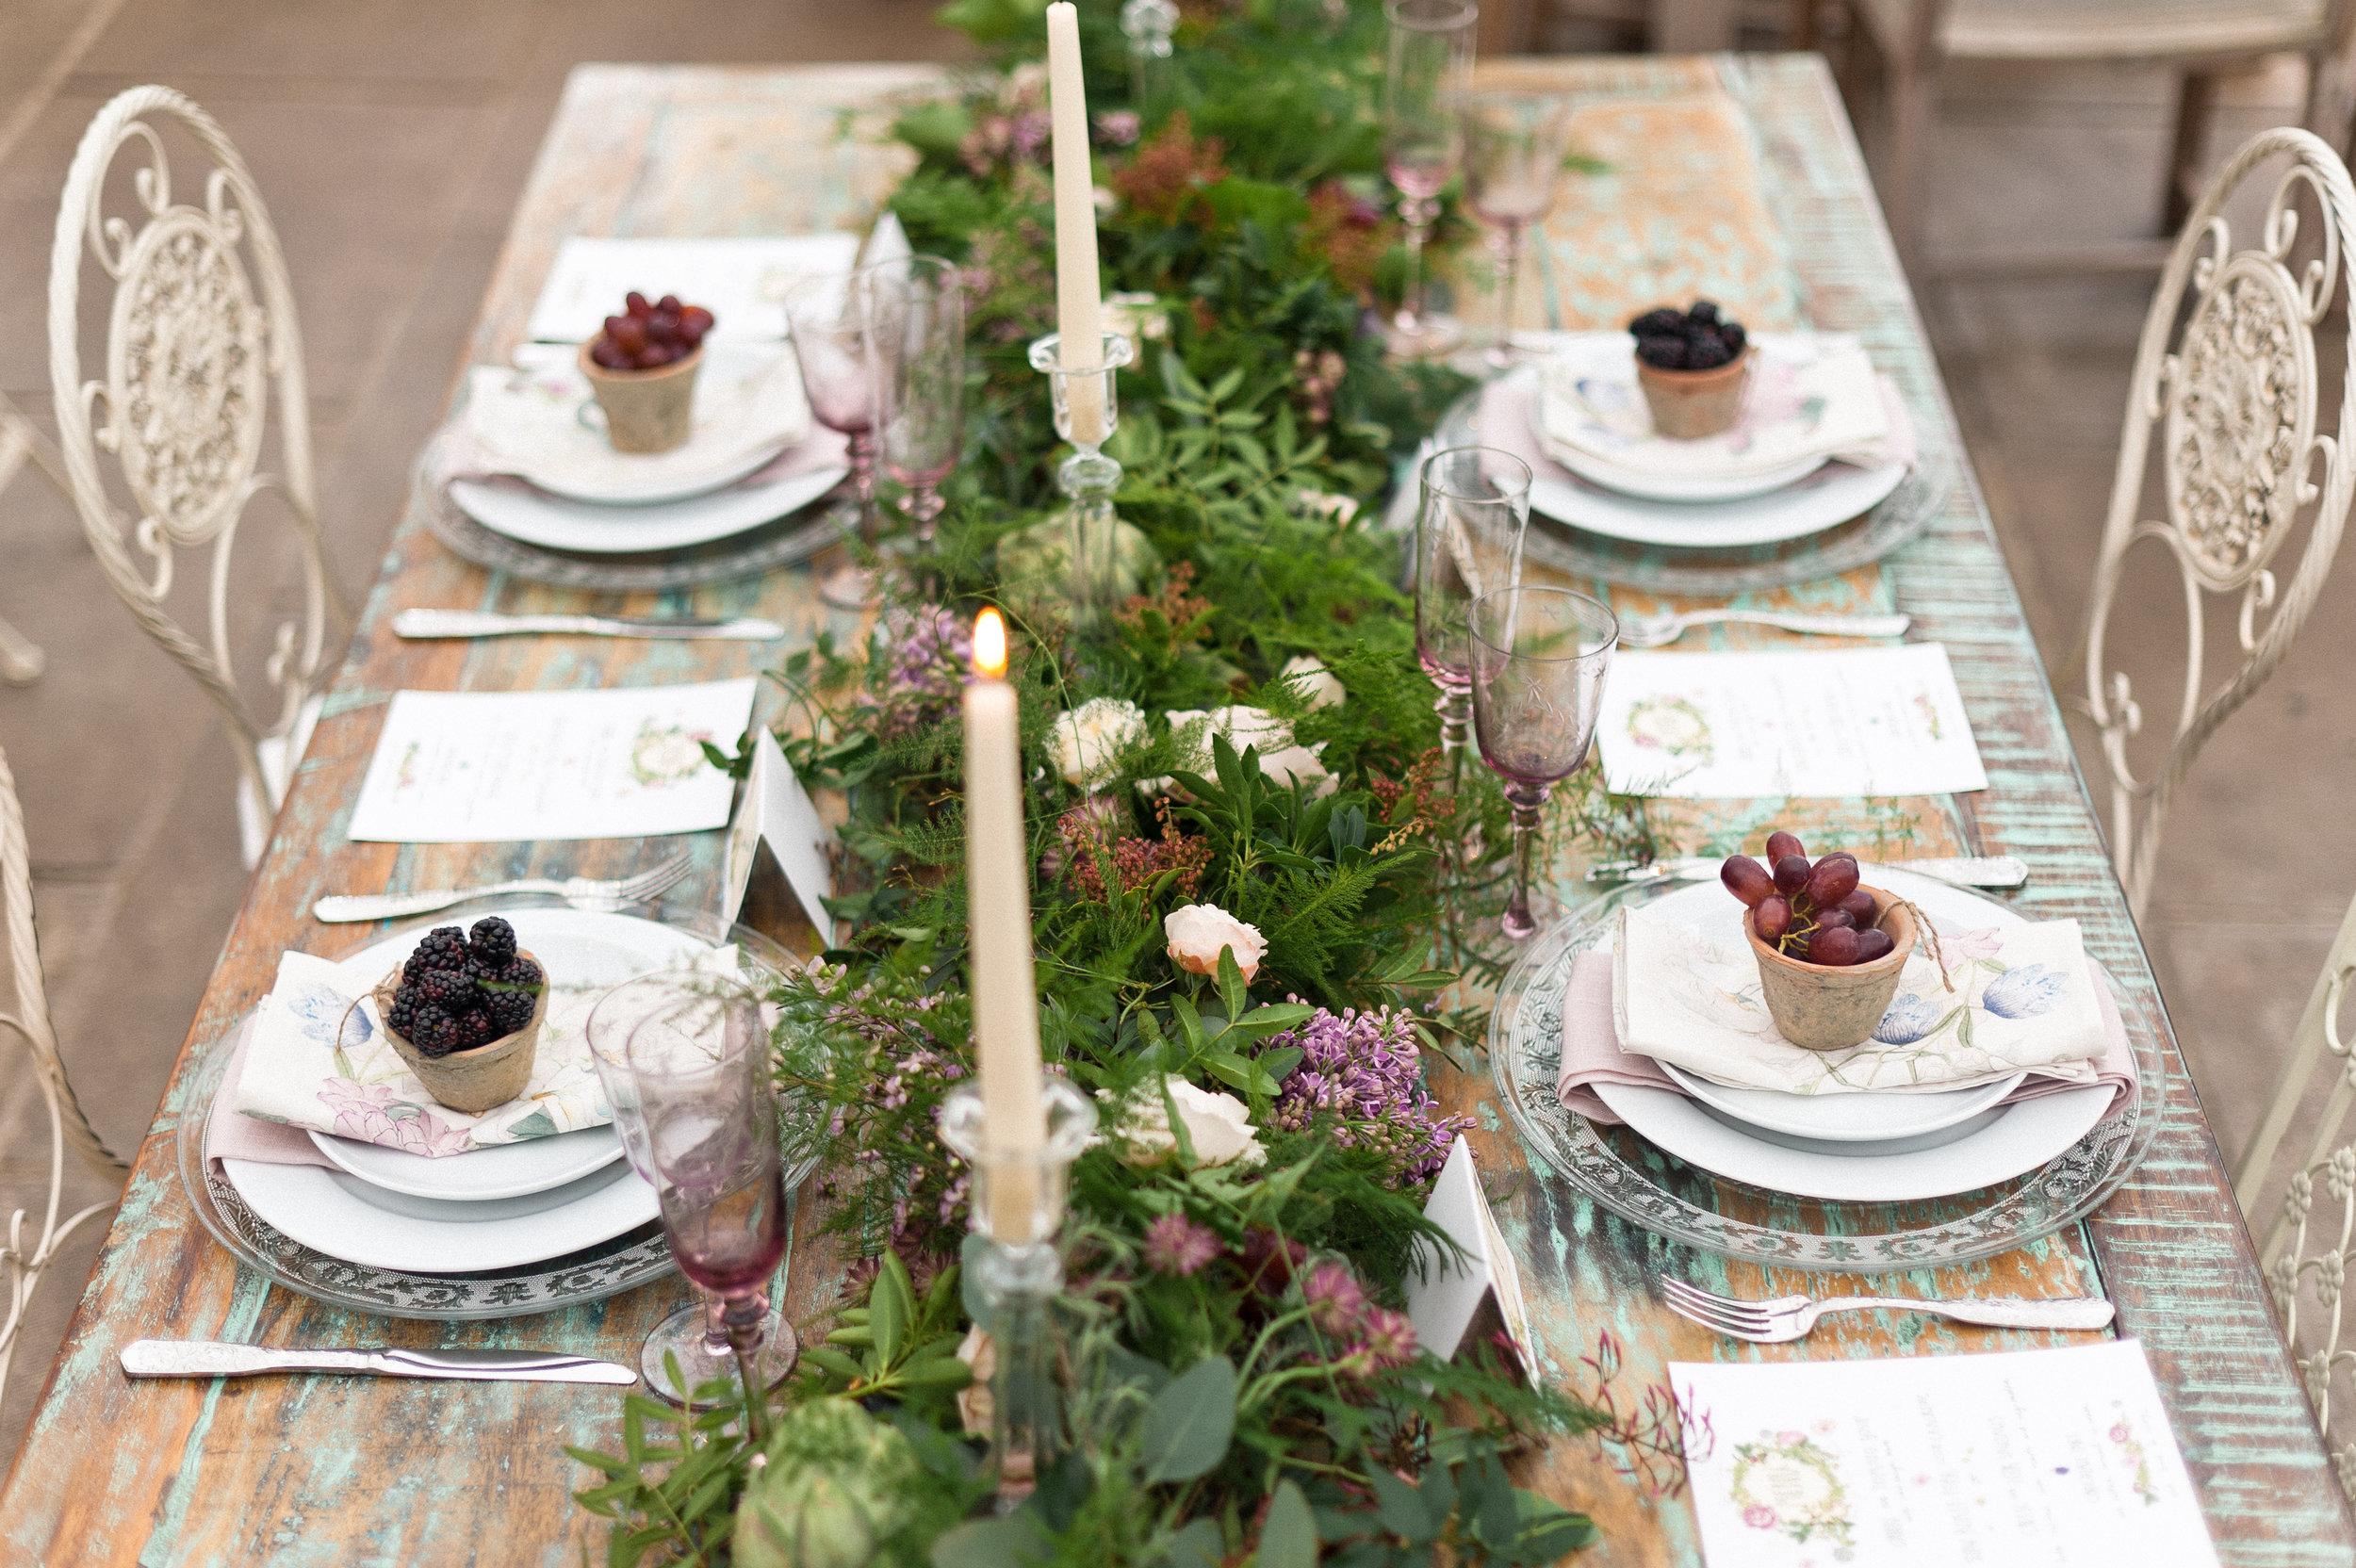 20140311-53-anushe-low-photography-clifton-nurseries-wedding-london-styled-shoot.jpg